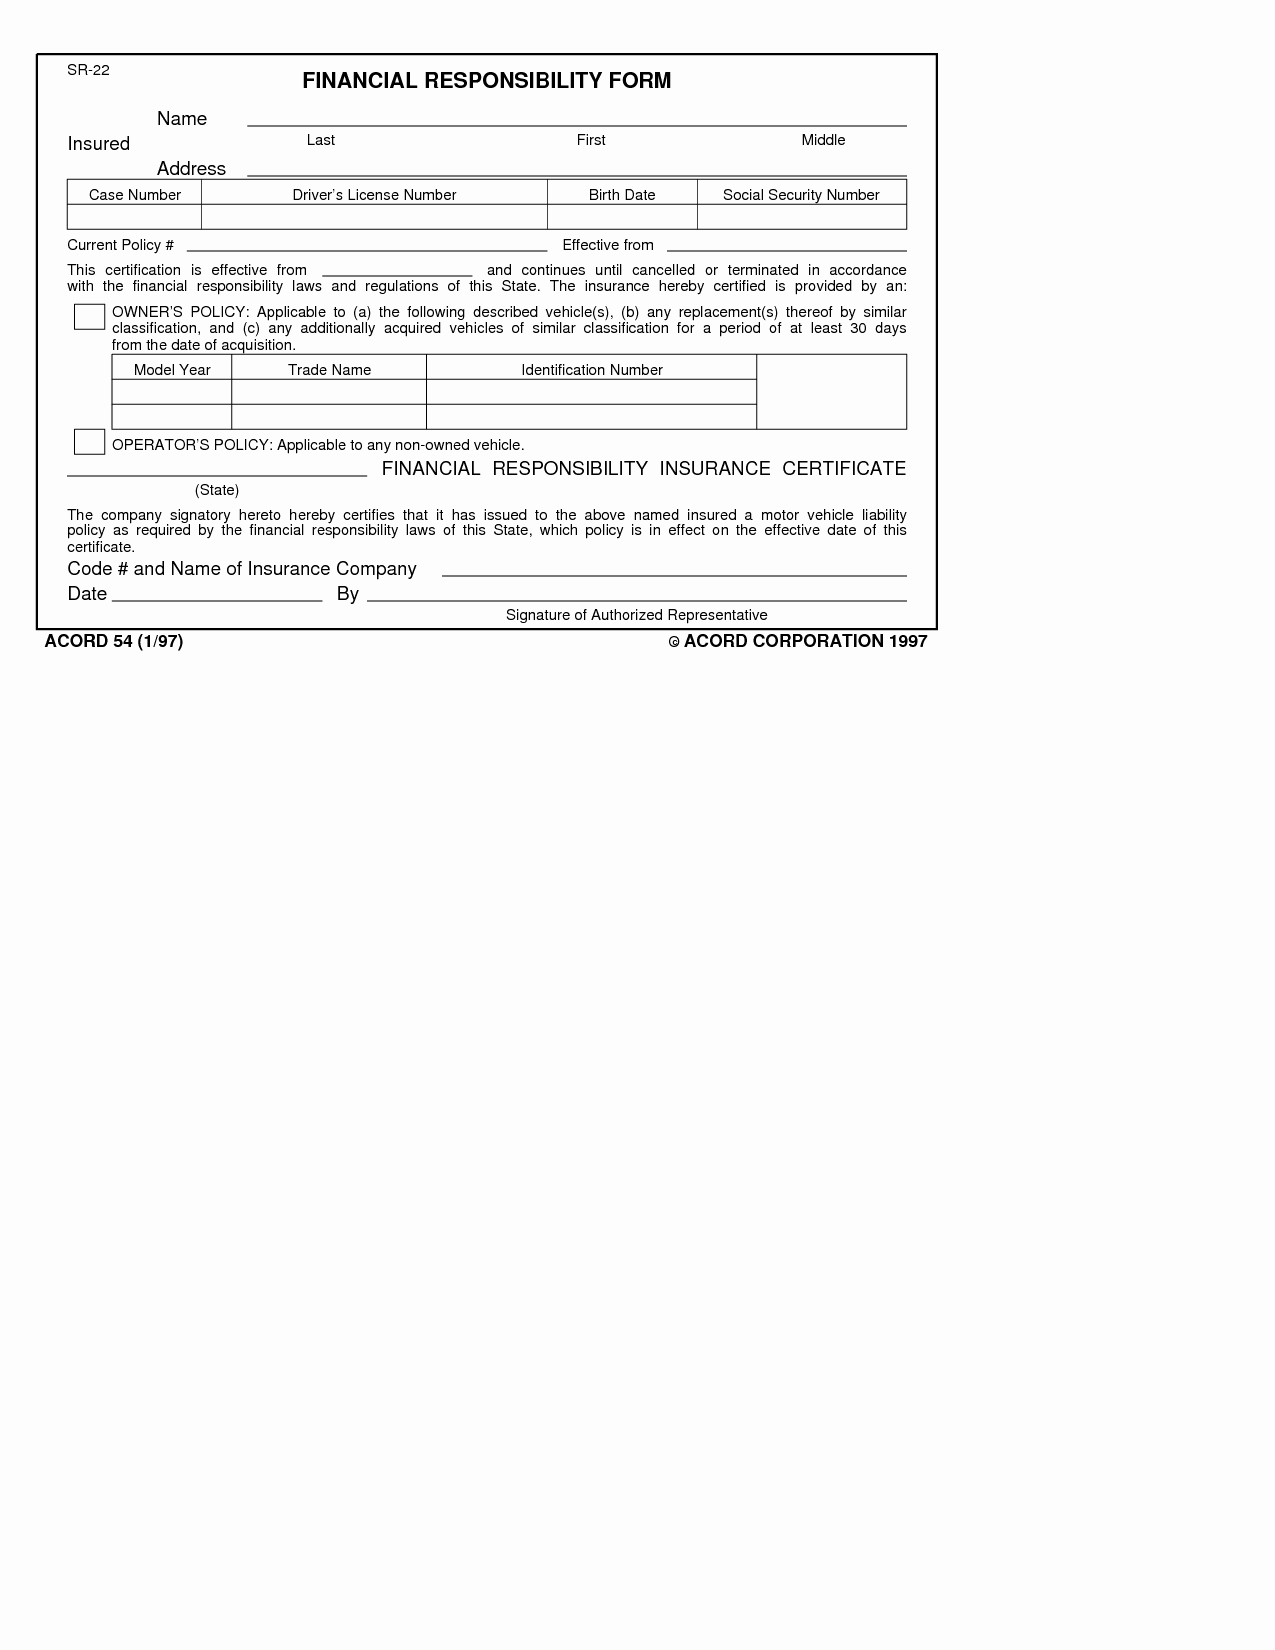 Car Insurance Card Template Download Beautiful Texas Liability Insurance Card